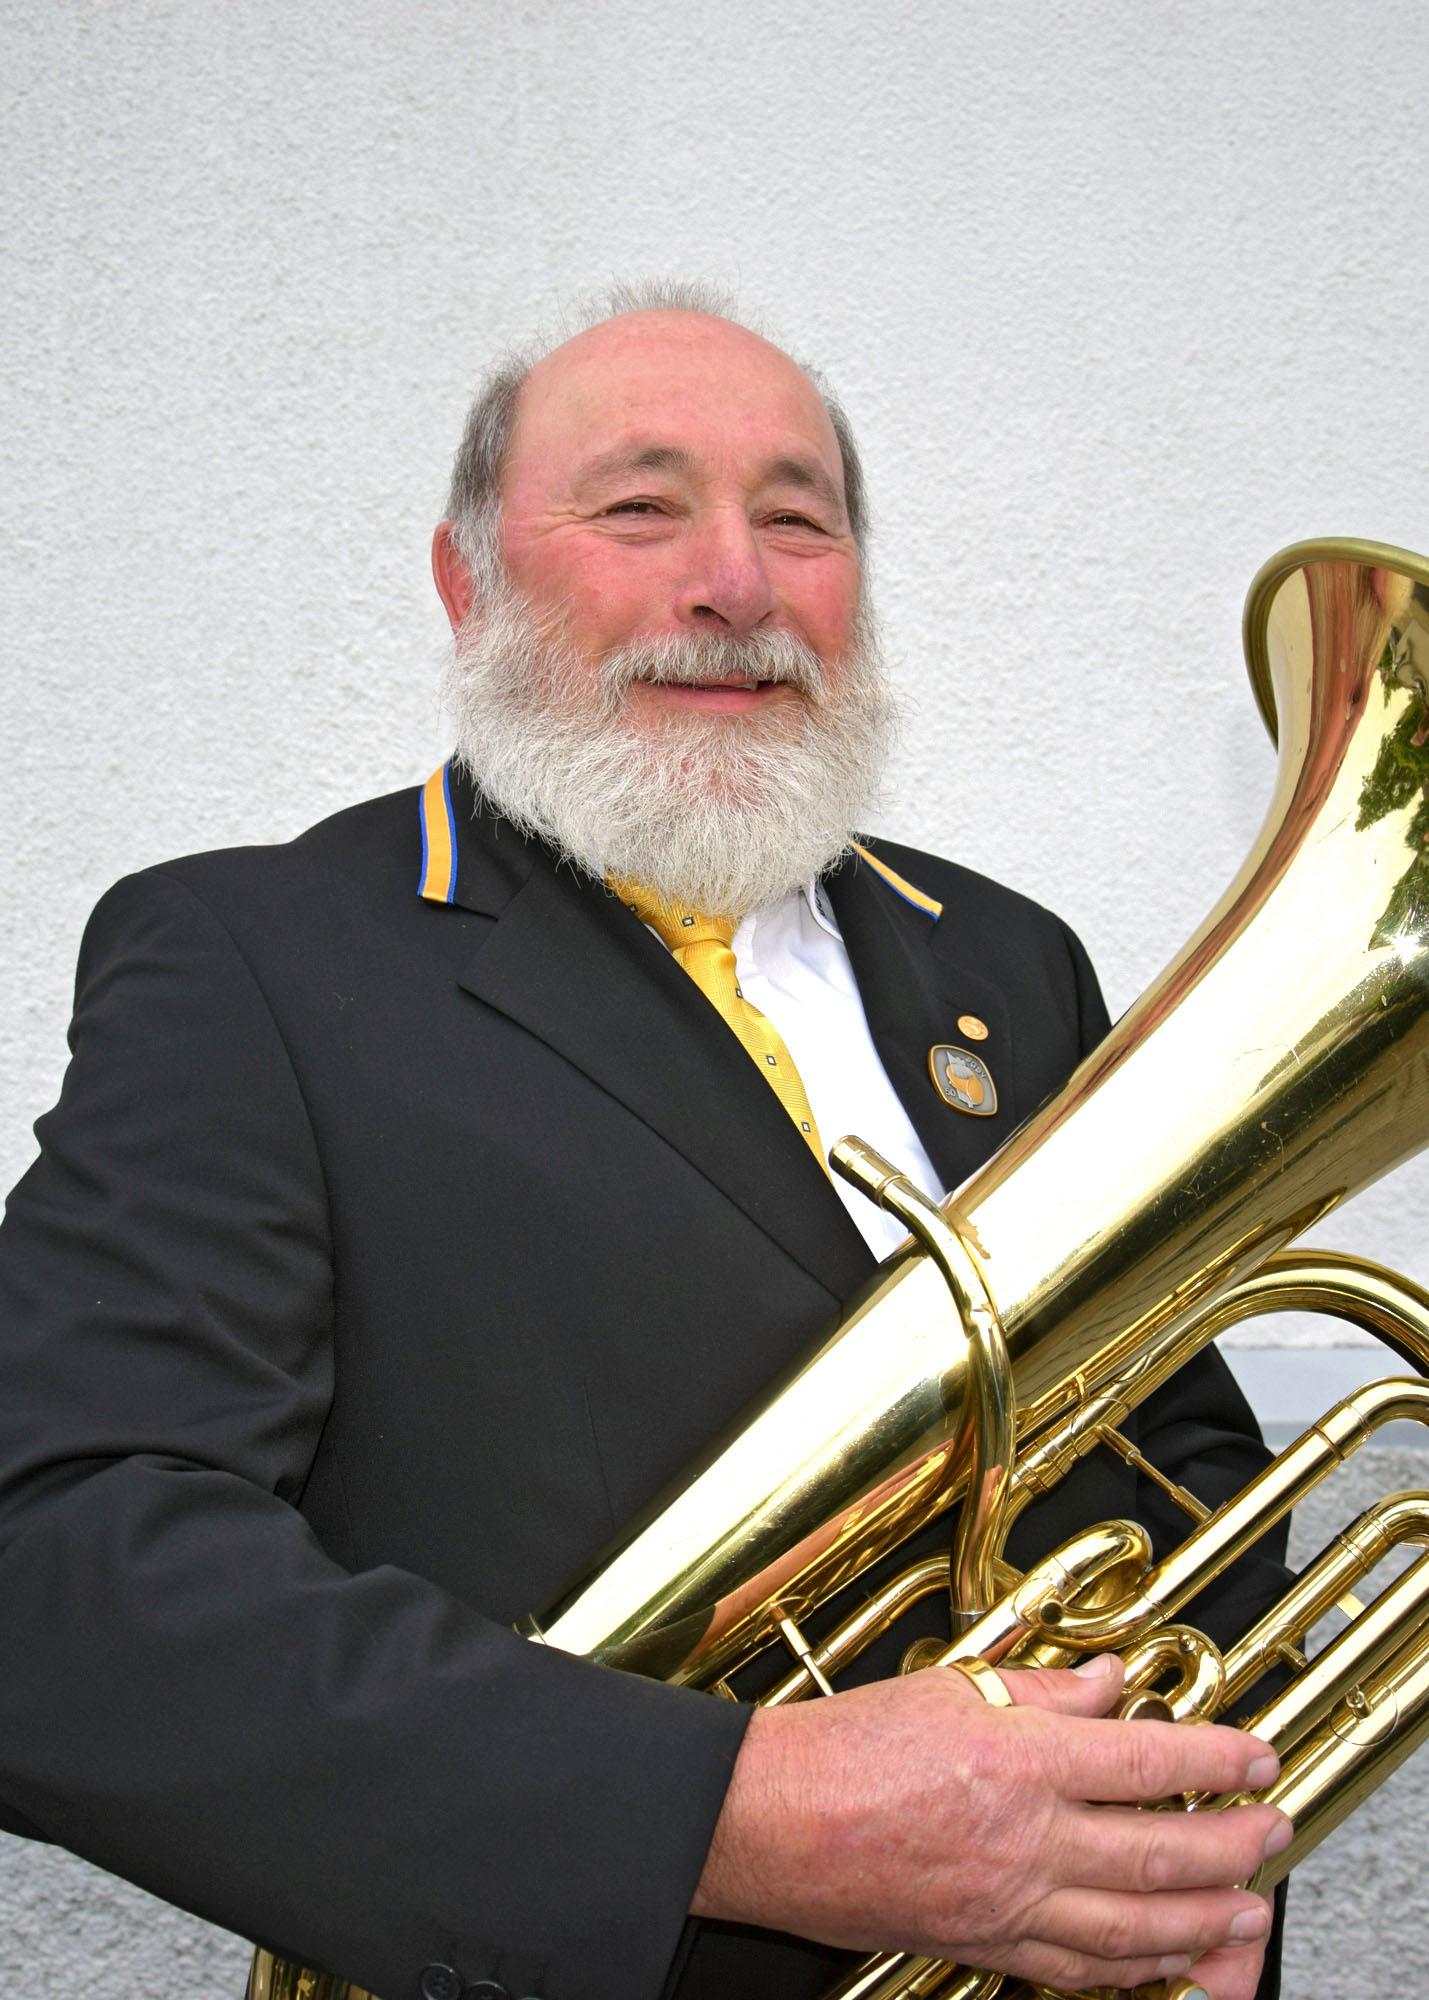 Linus Geisser